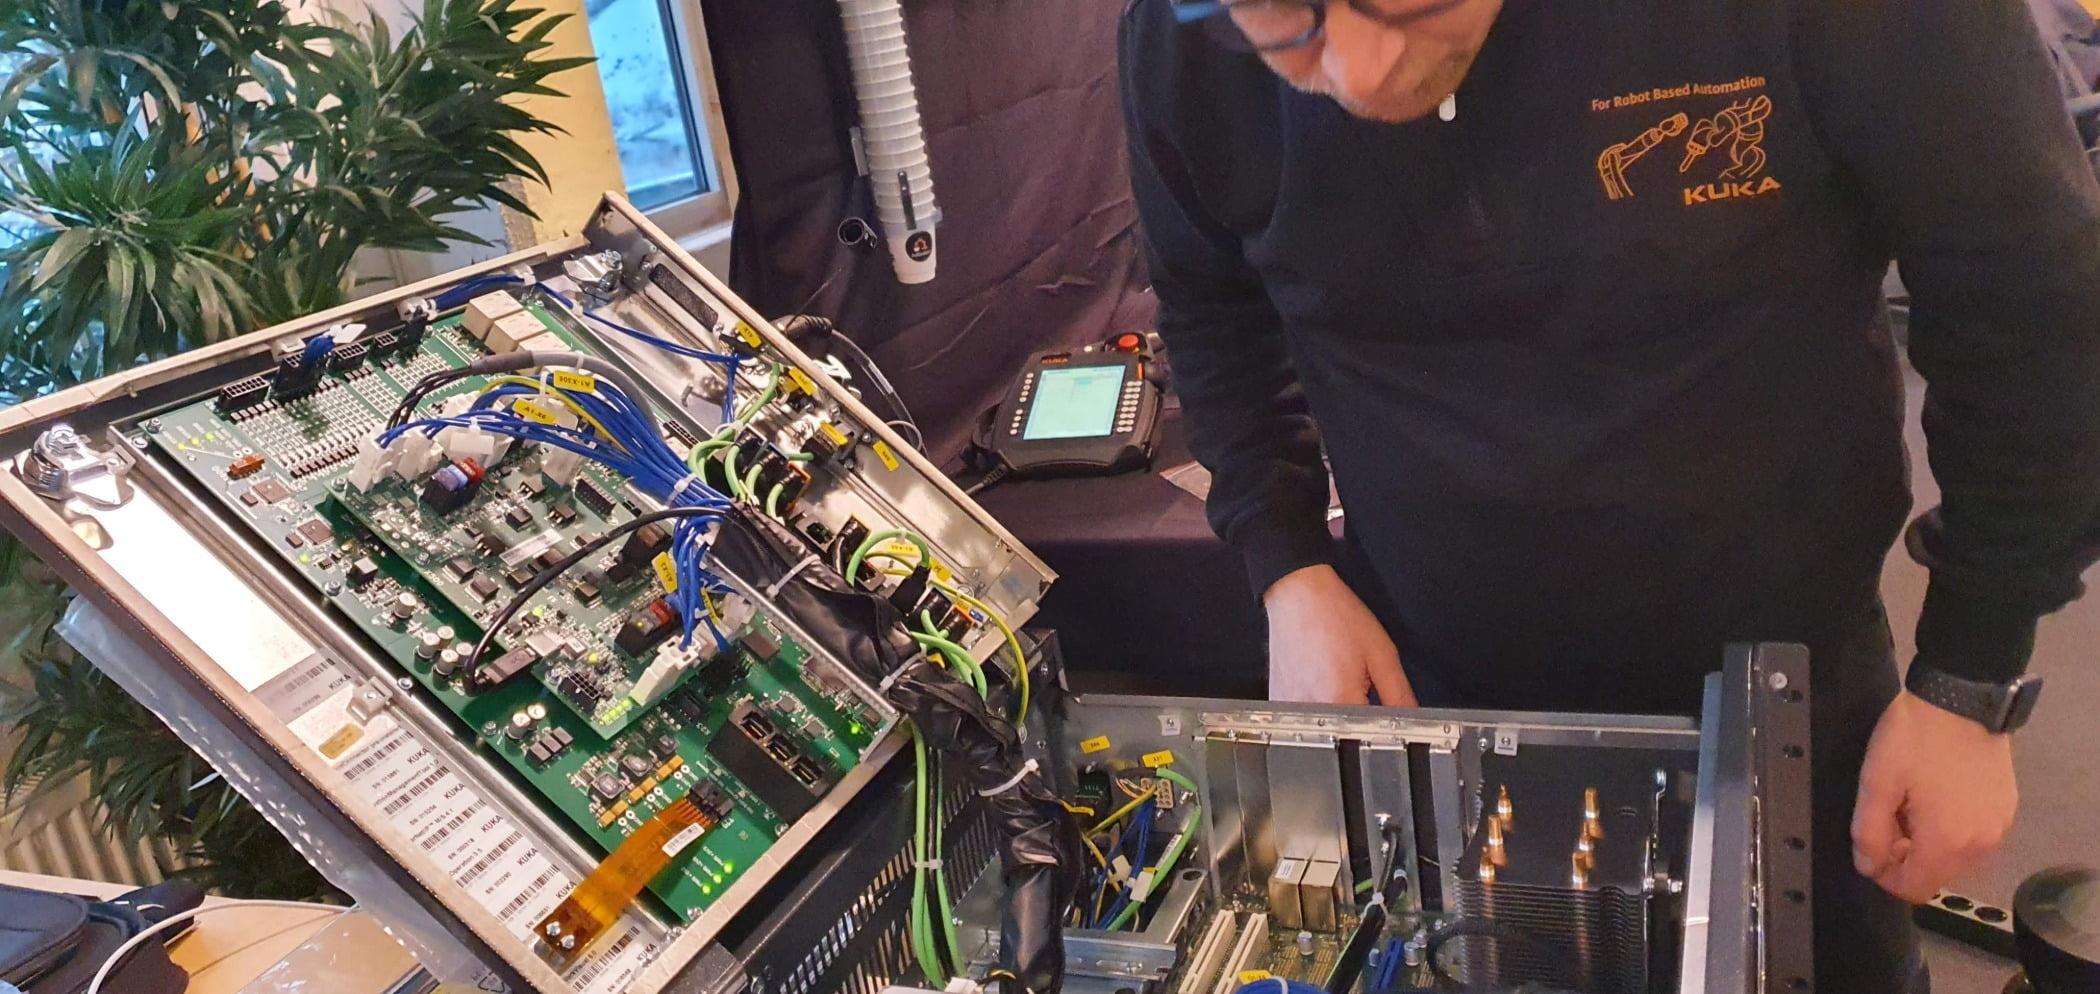 Passive circuit component, Hardware programmer, Audio equipment, Electronic instrument